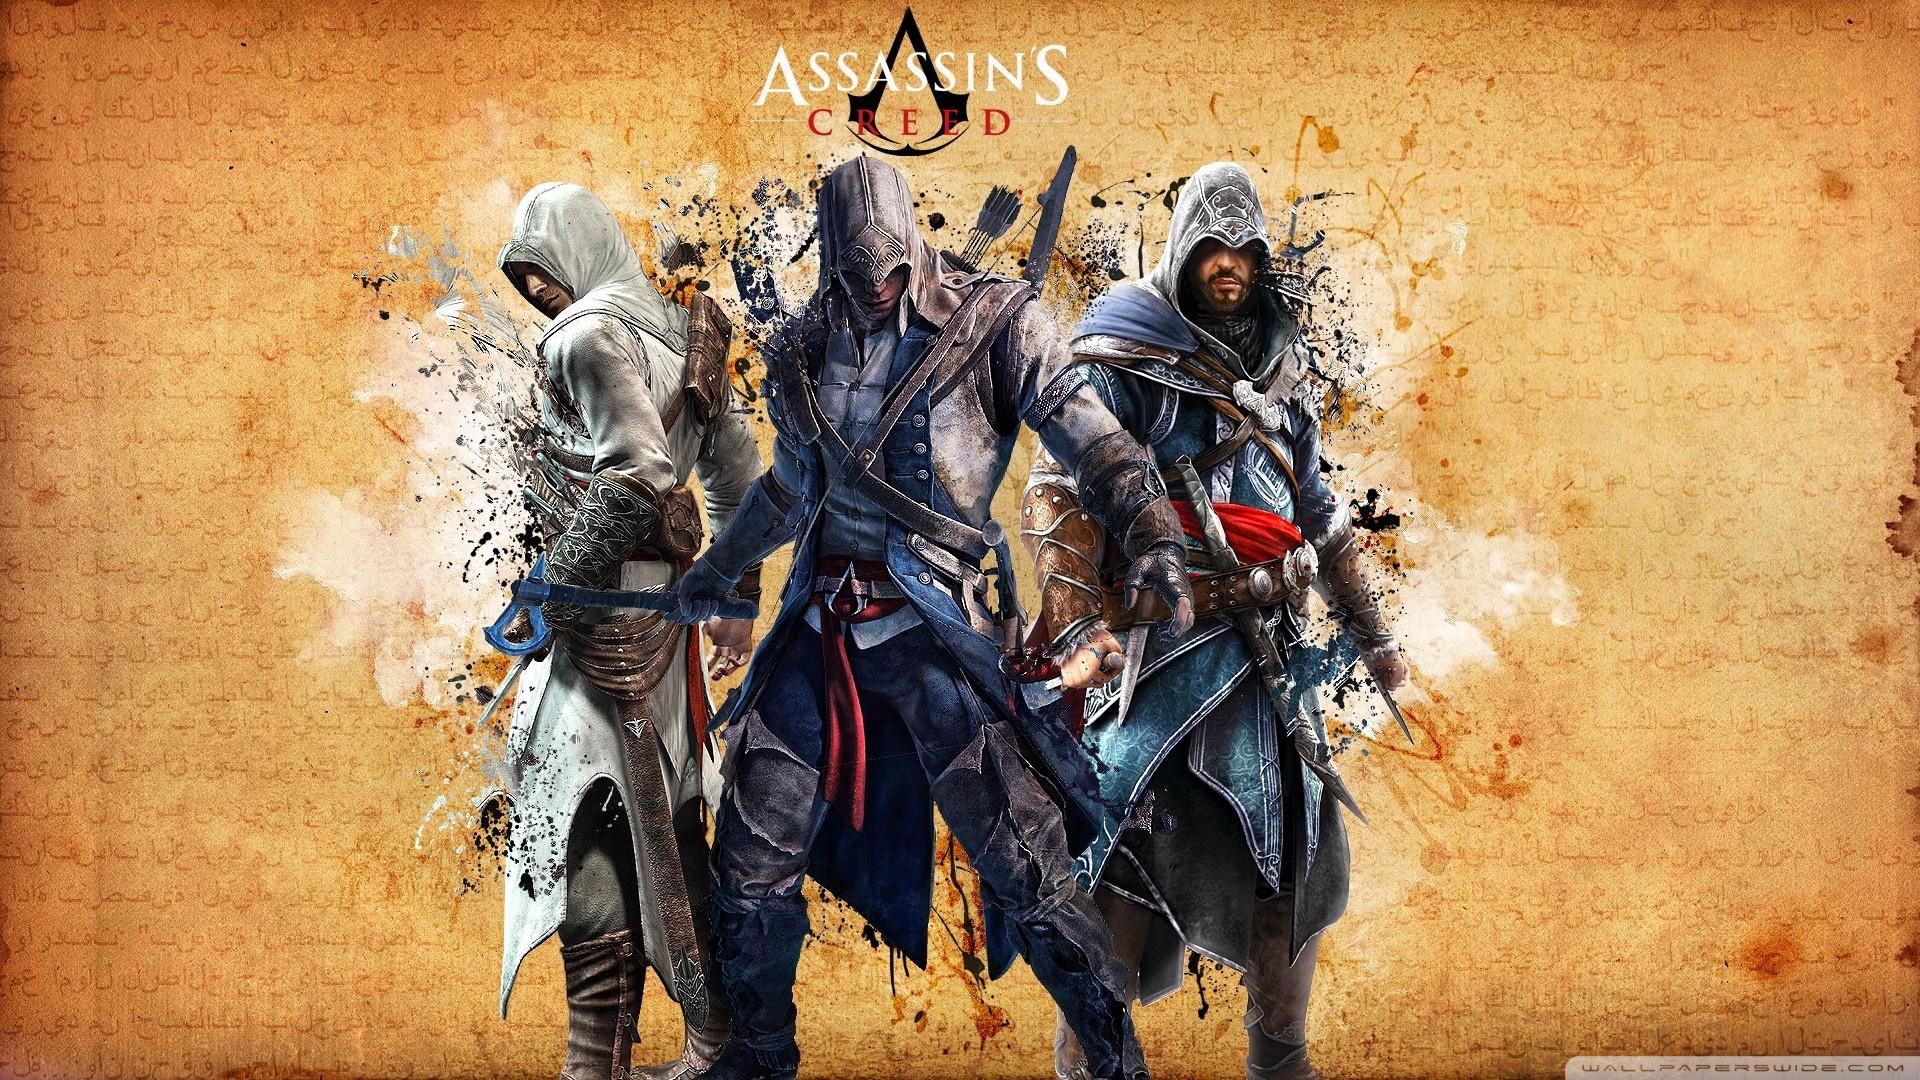 Assassins Creed 3 2012 Wallpaper 1920x1080 Assassins Creed 3 2012 1920x1080